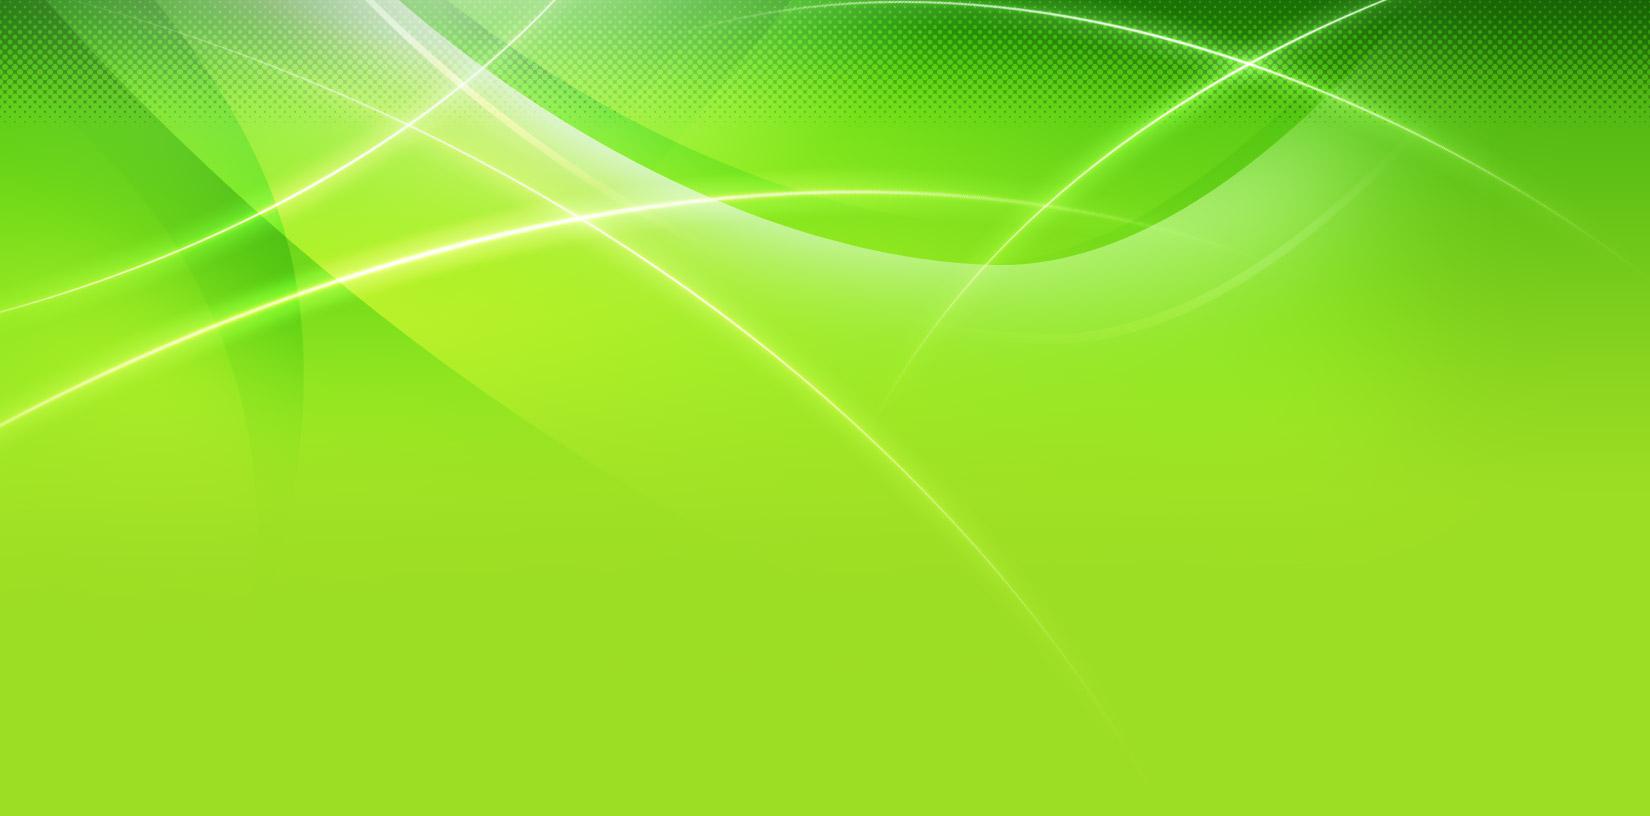 Green Background 12  1650x816